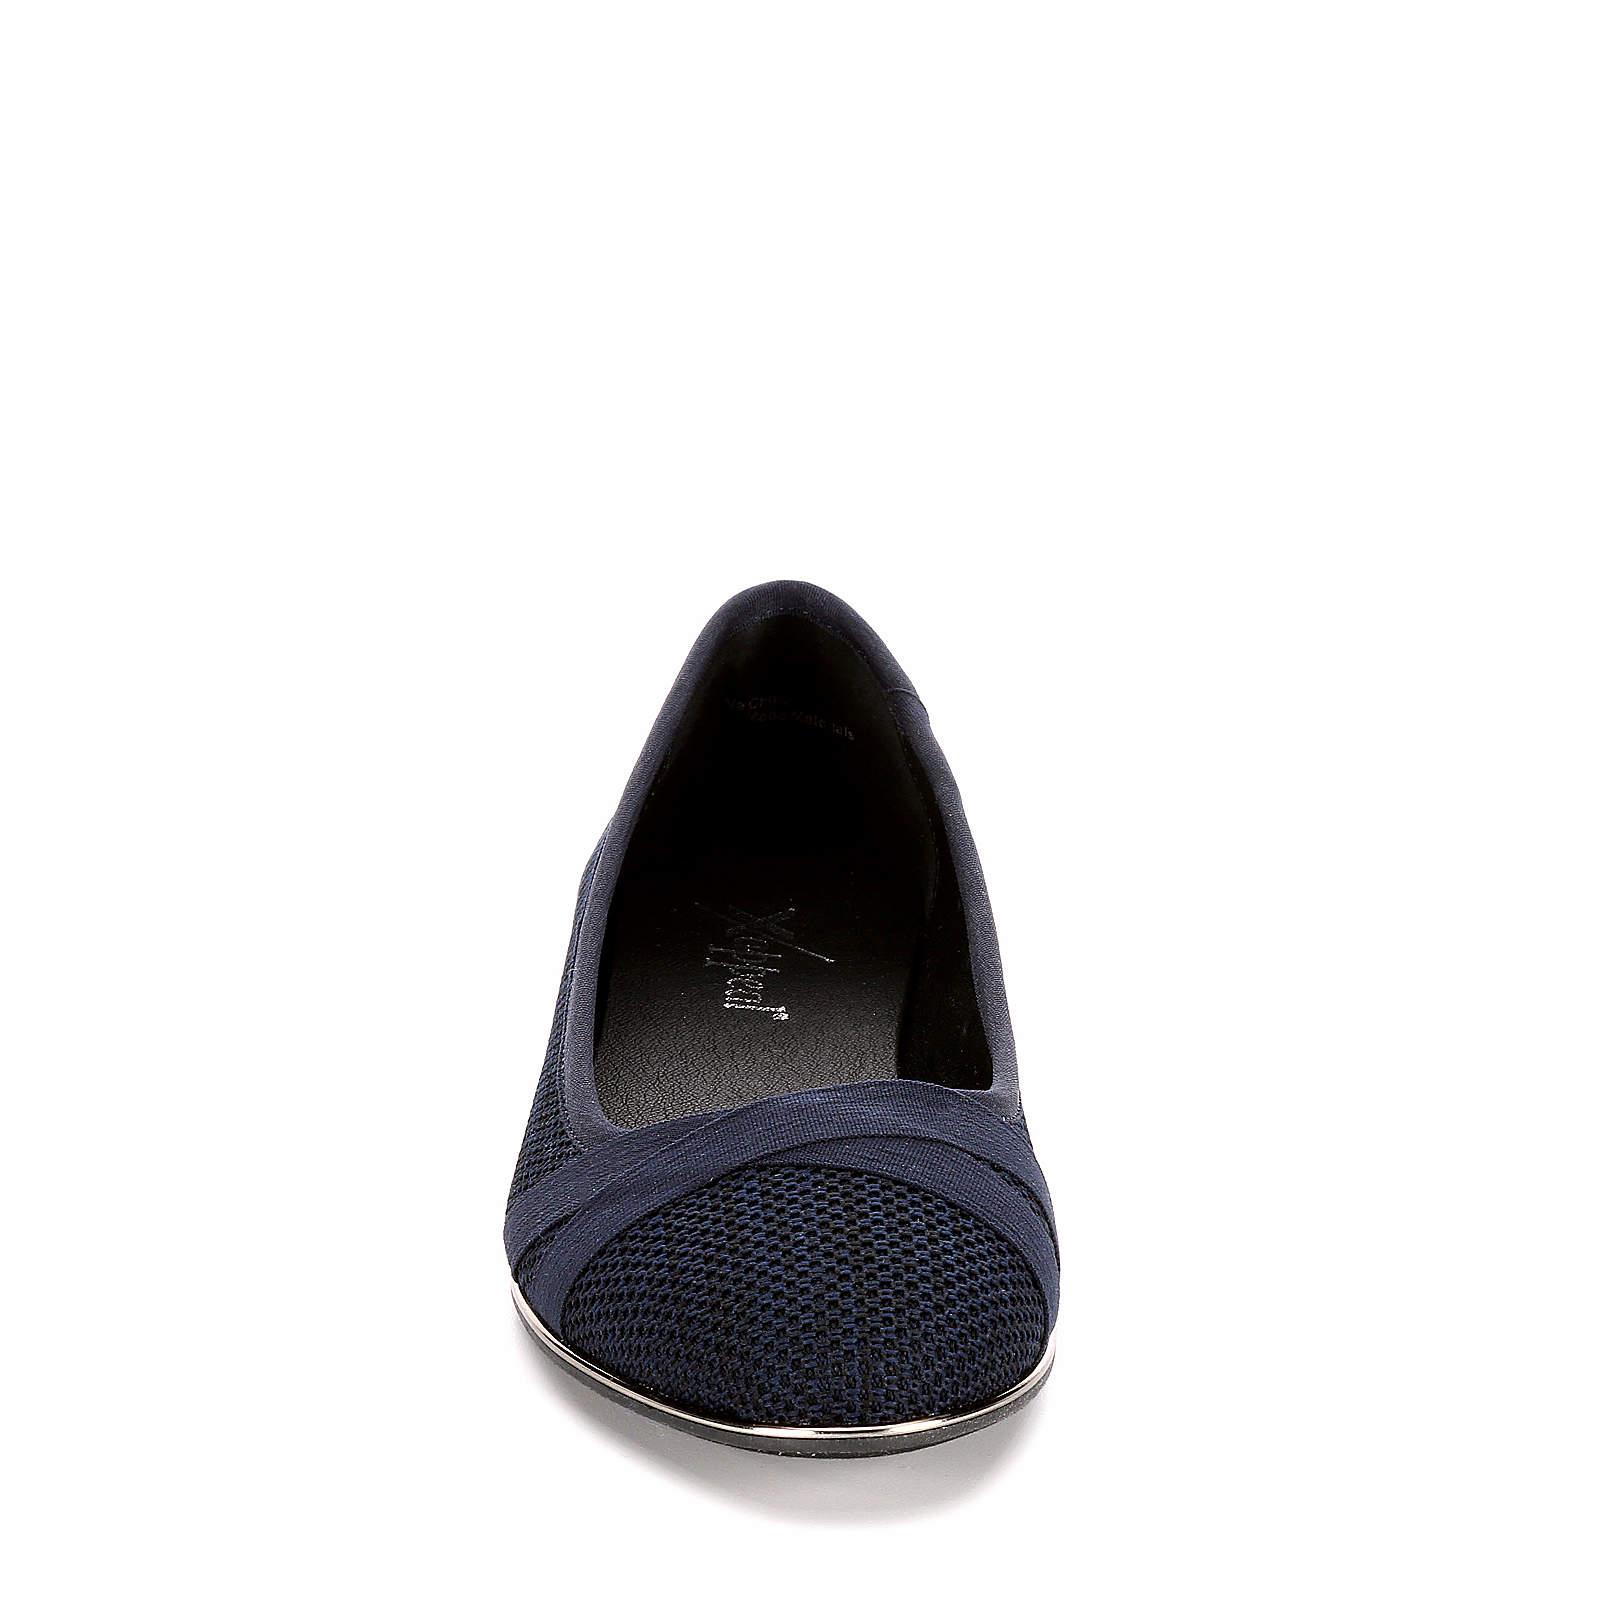 XAPPEAL-Womens-Mitzie-Slip-On-Mesh-Flat-Shoes thumbnail 4